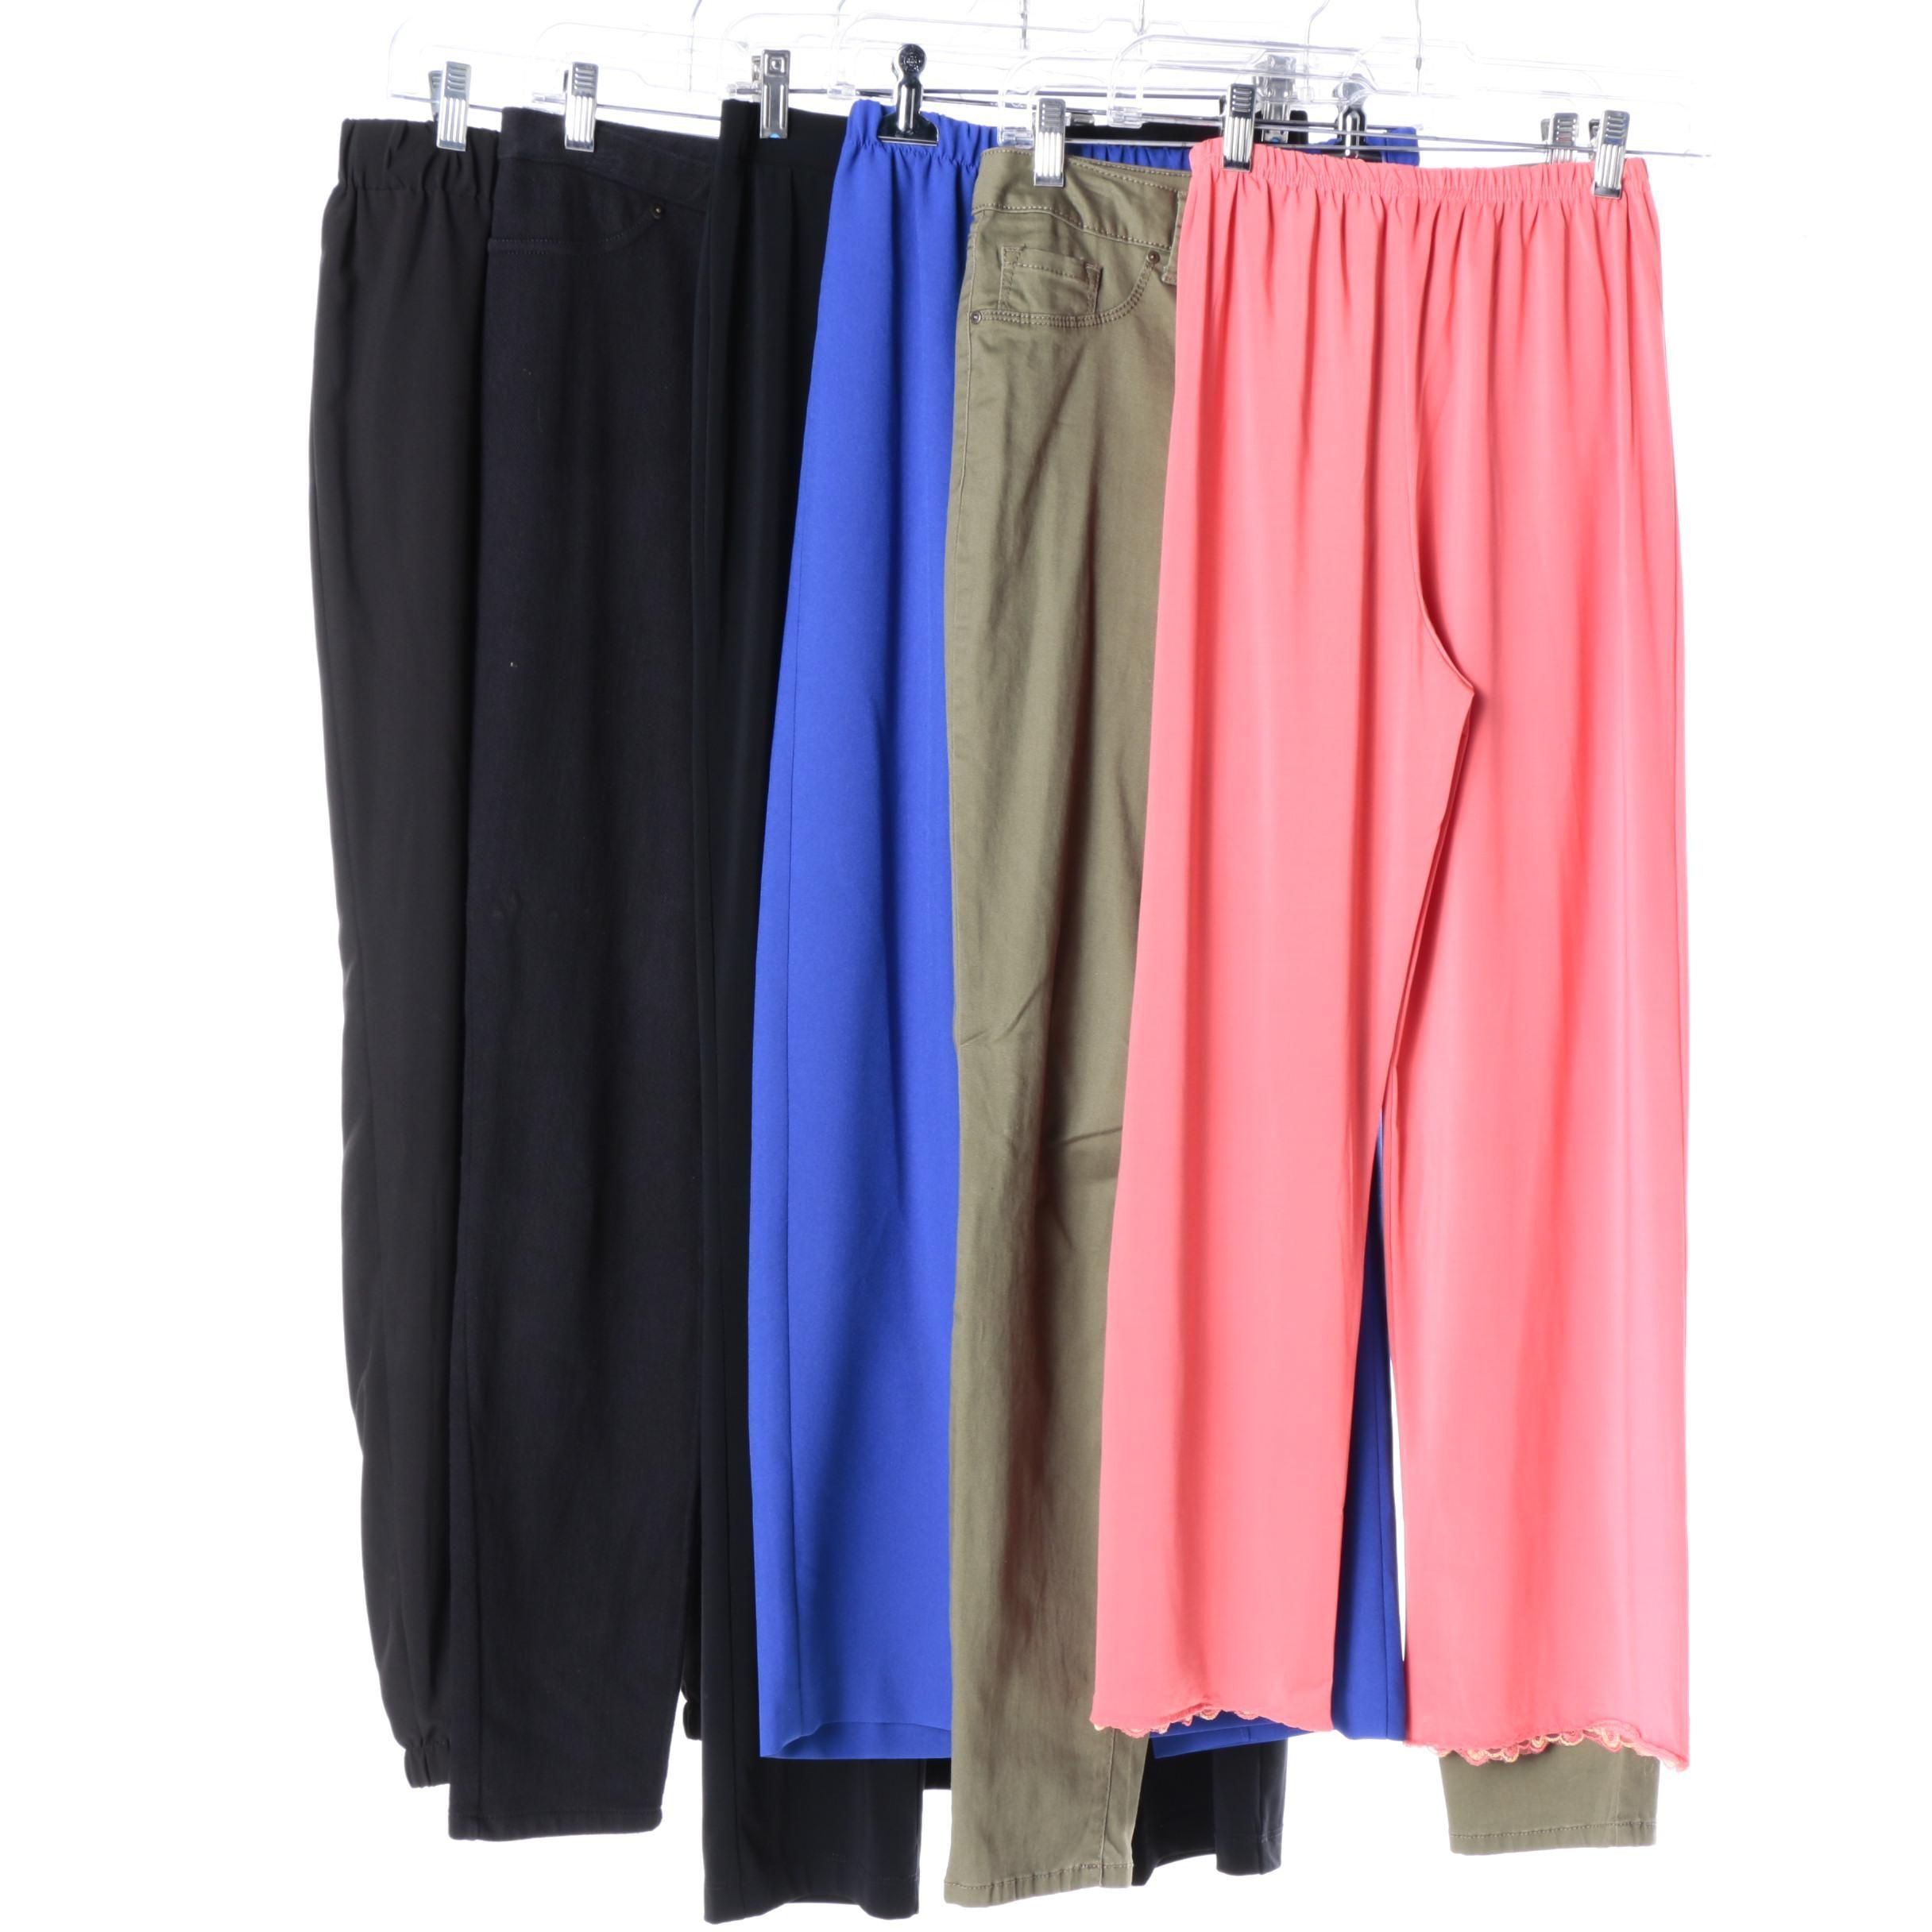 Women's Pants Including Jessica Simpson